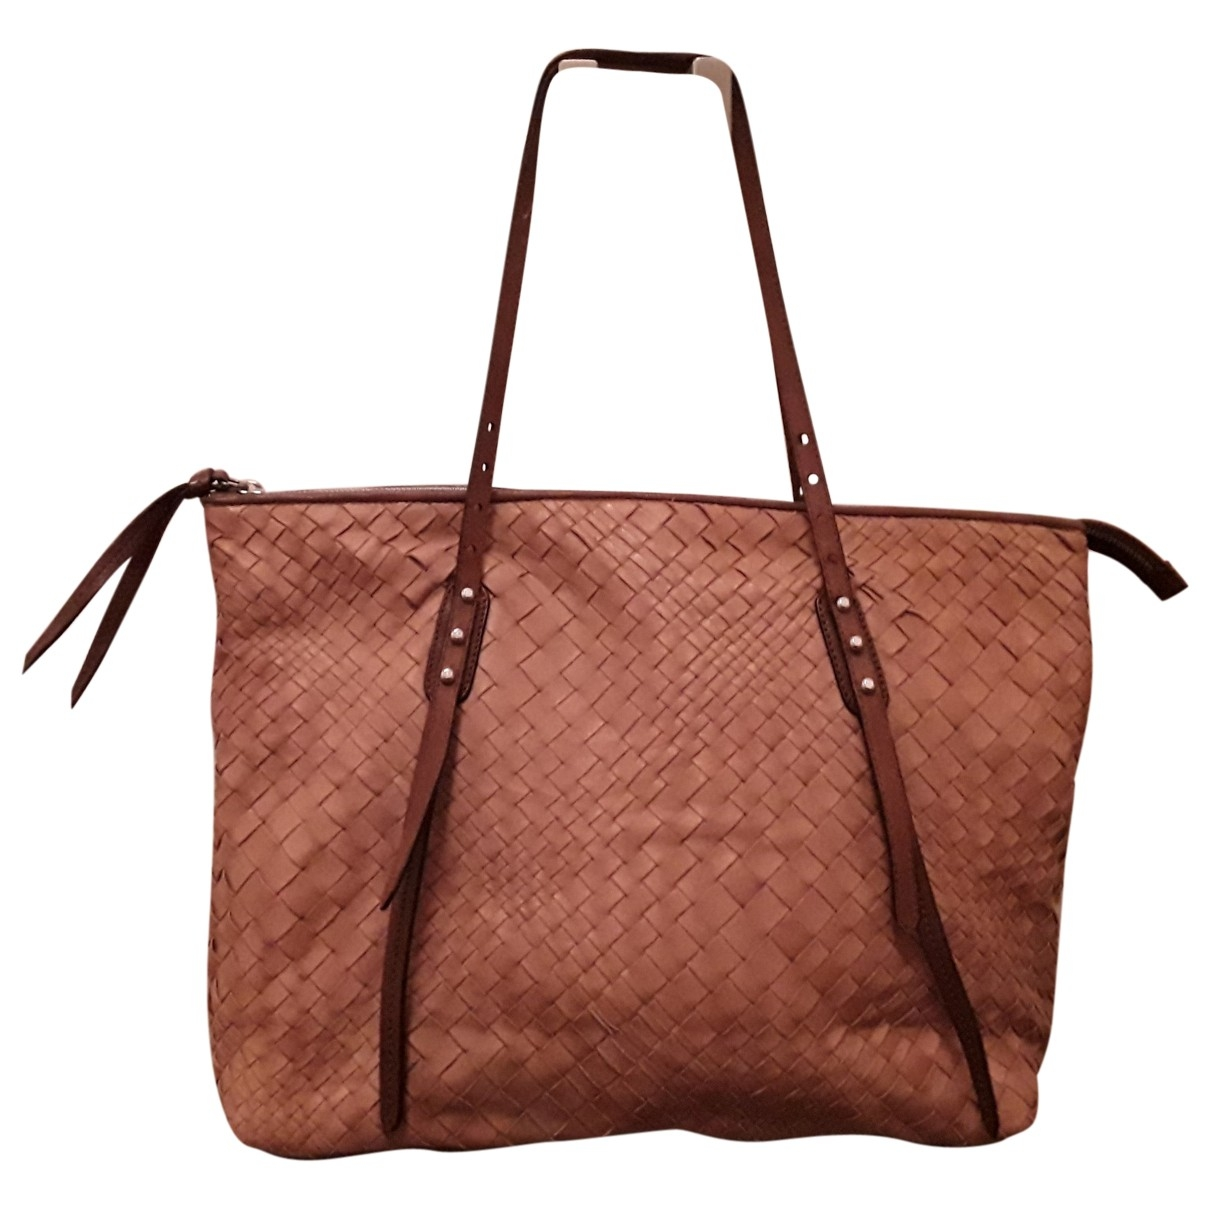 Falorni Italy - Sac a main   pour femme en cuir - marron